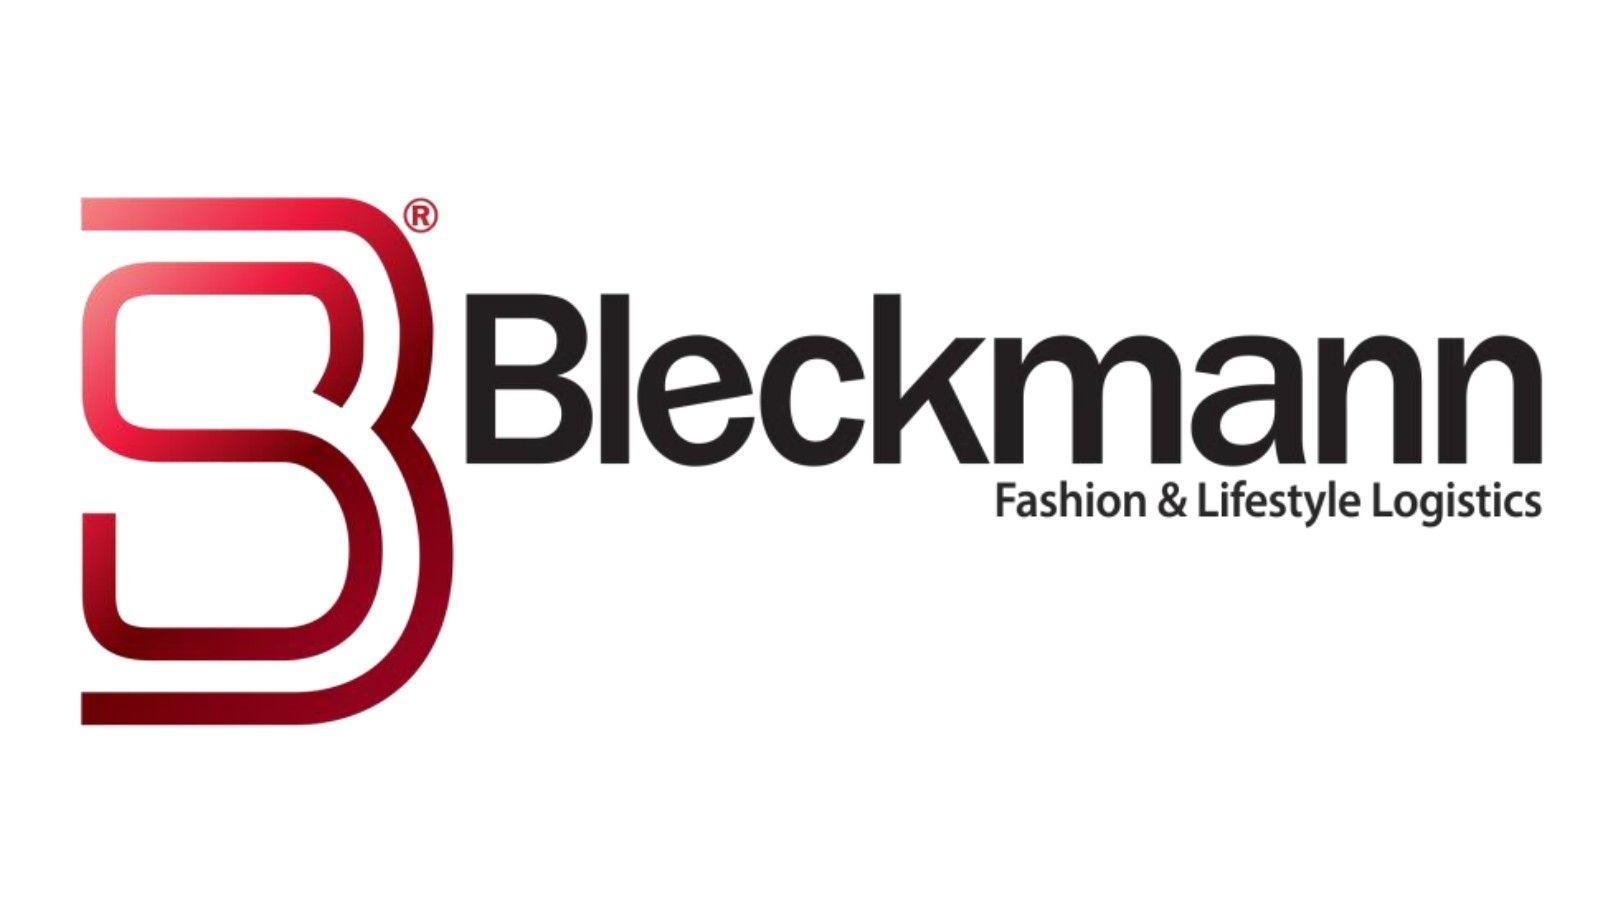 Welkom Bleckmann